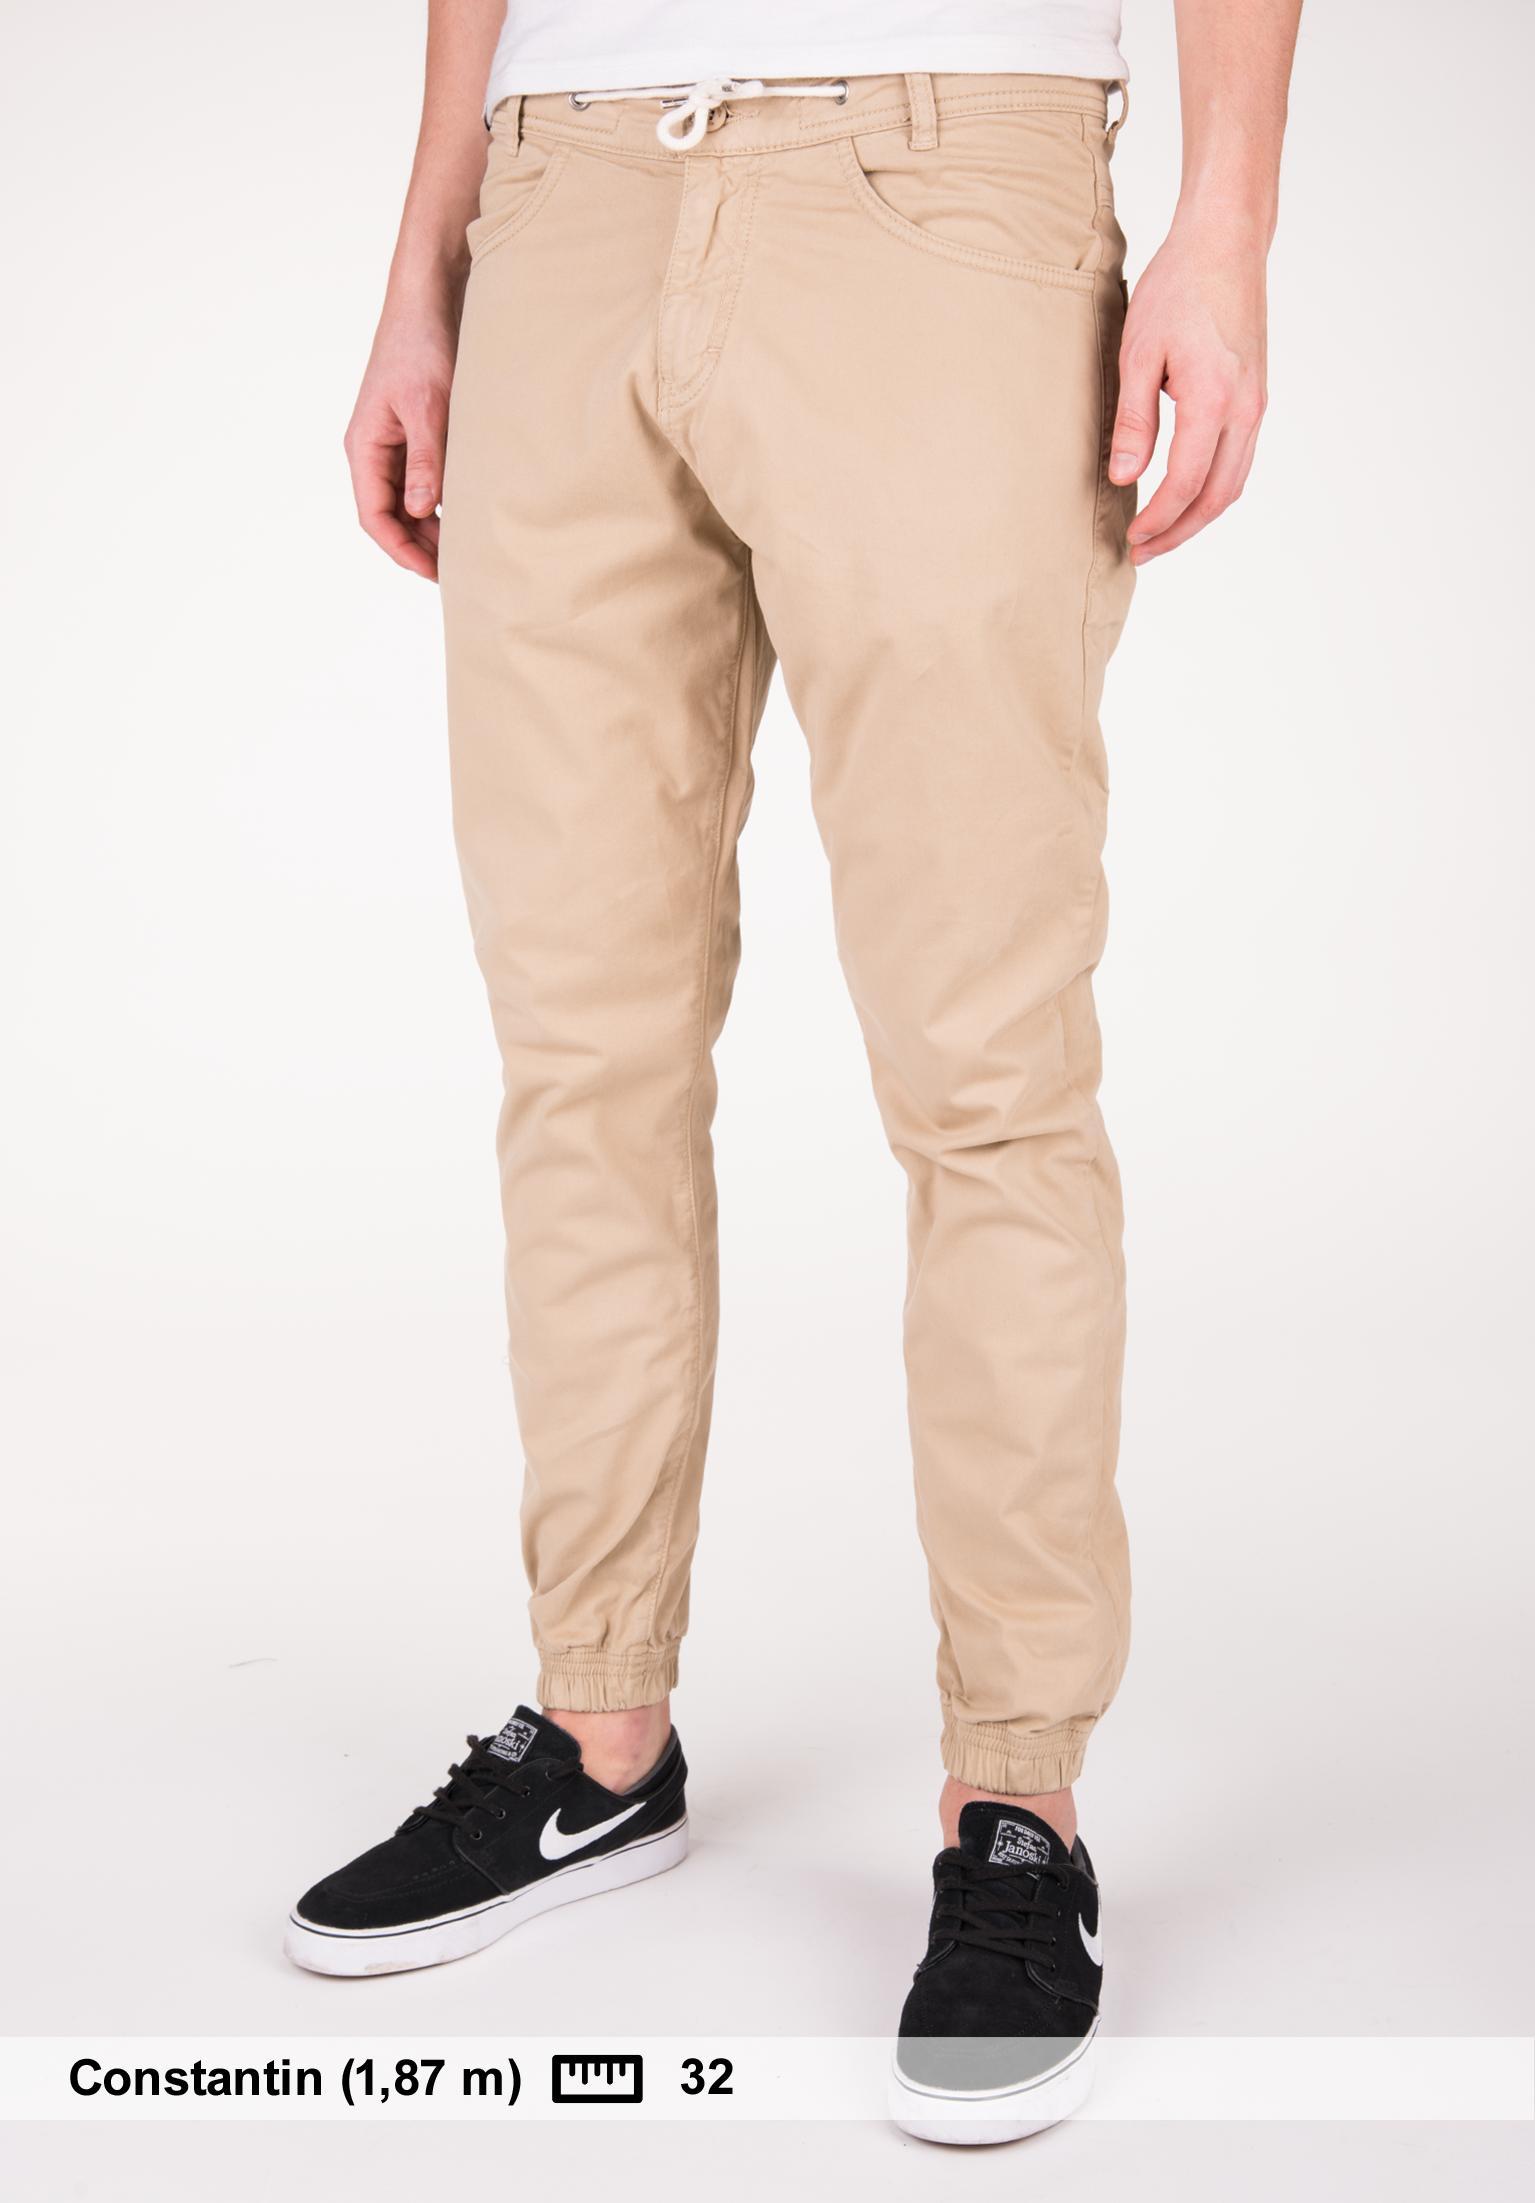 In Nautical Chinos Trousers Hombre Makia Für Titus Khaki Pantalones Or7rqIntxp